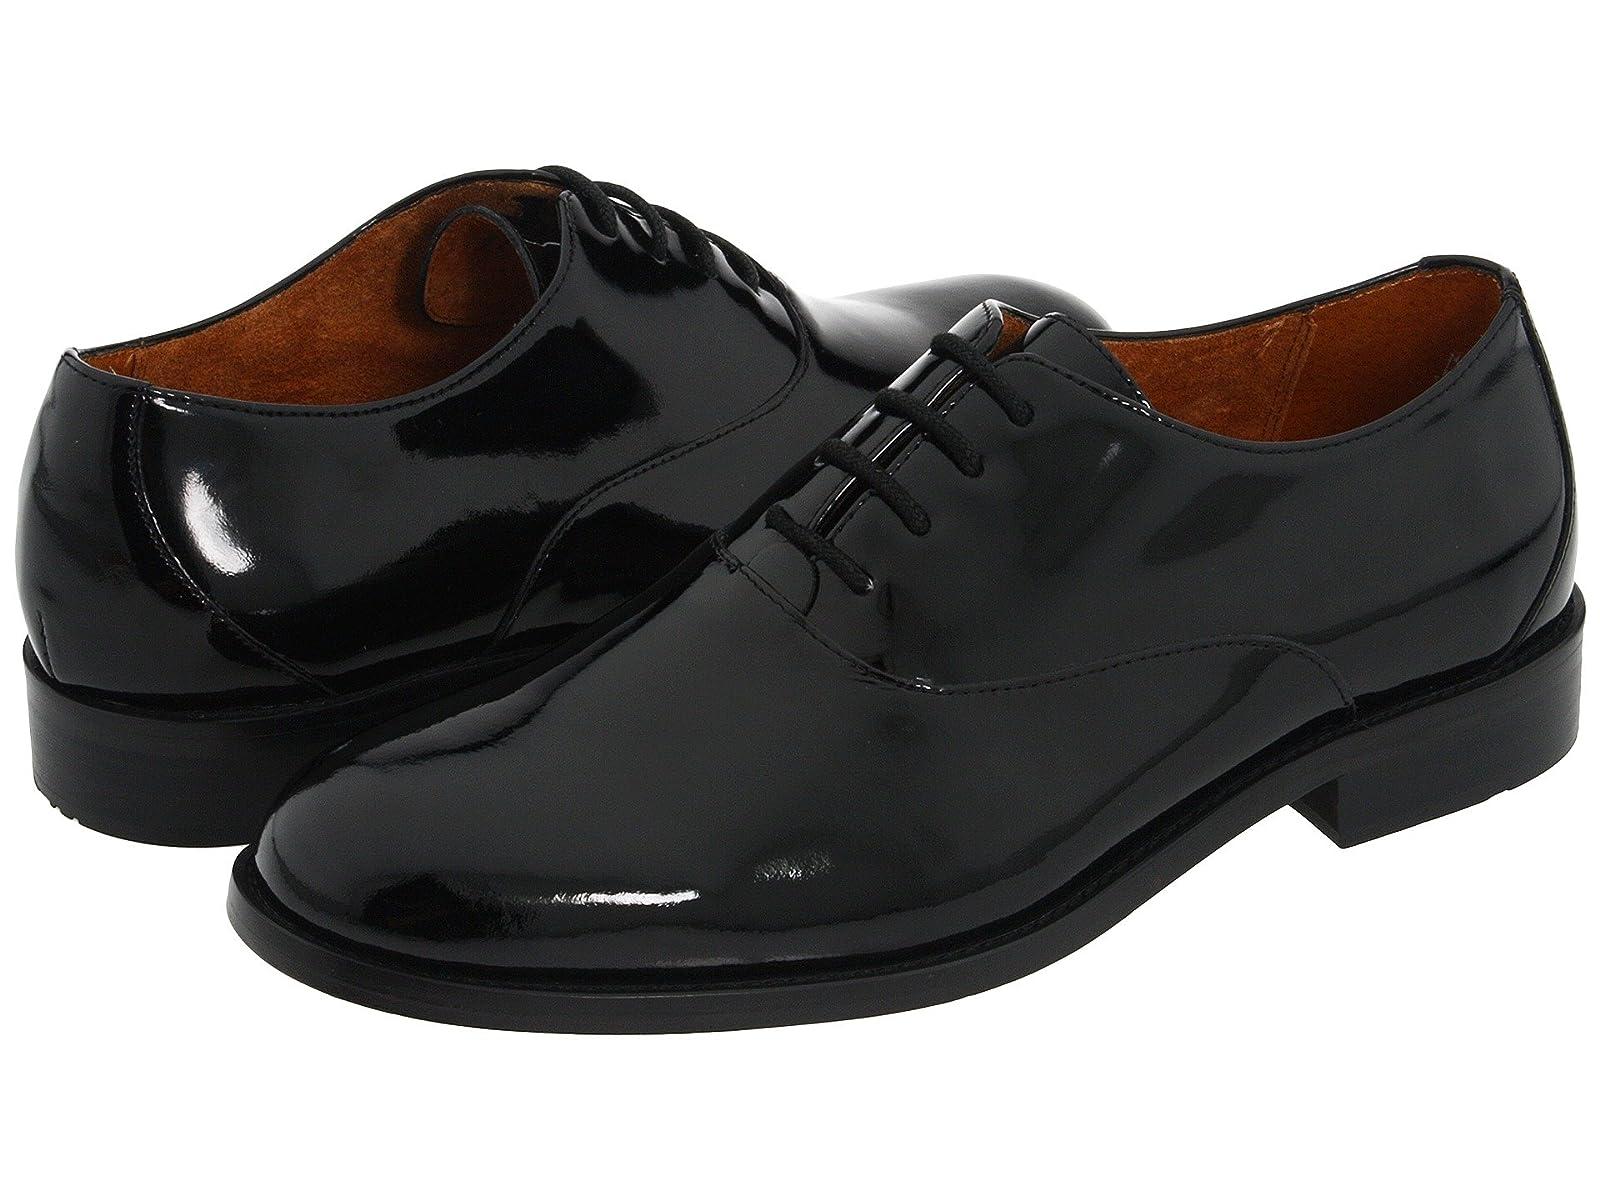 Florsheim Kingston Tuxedo OxfordCheap and distinctive eye-catching shoes